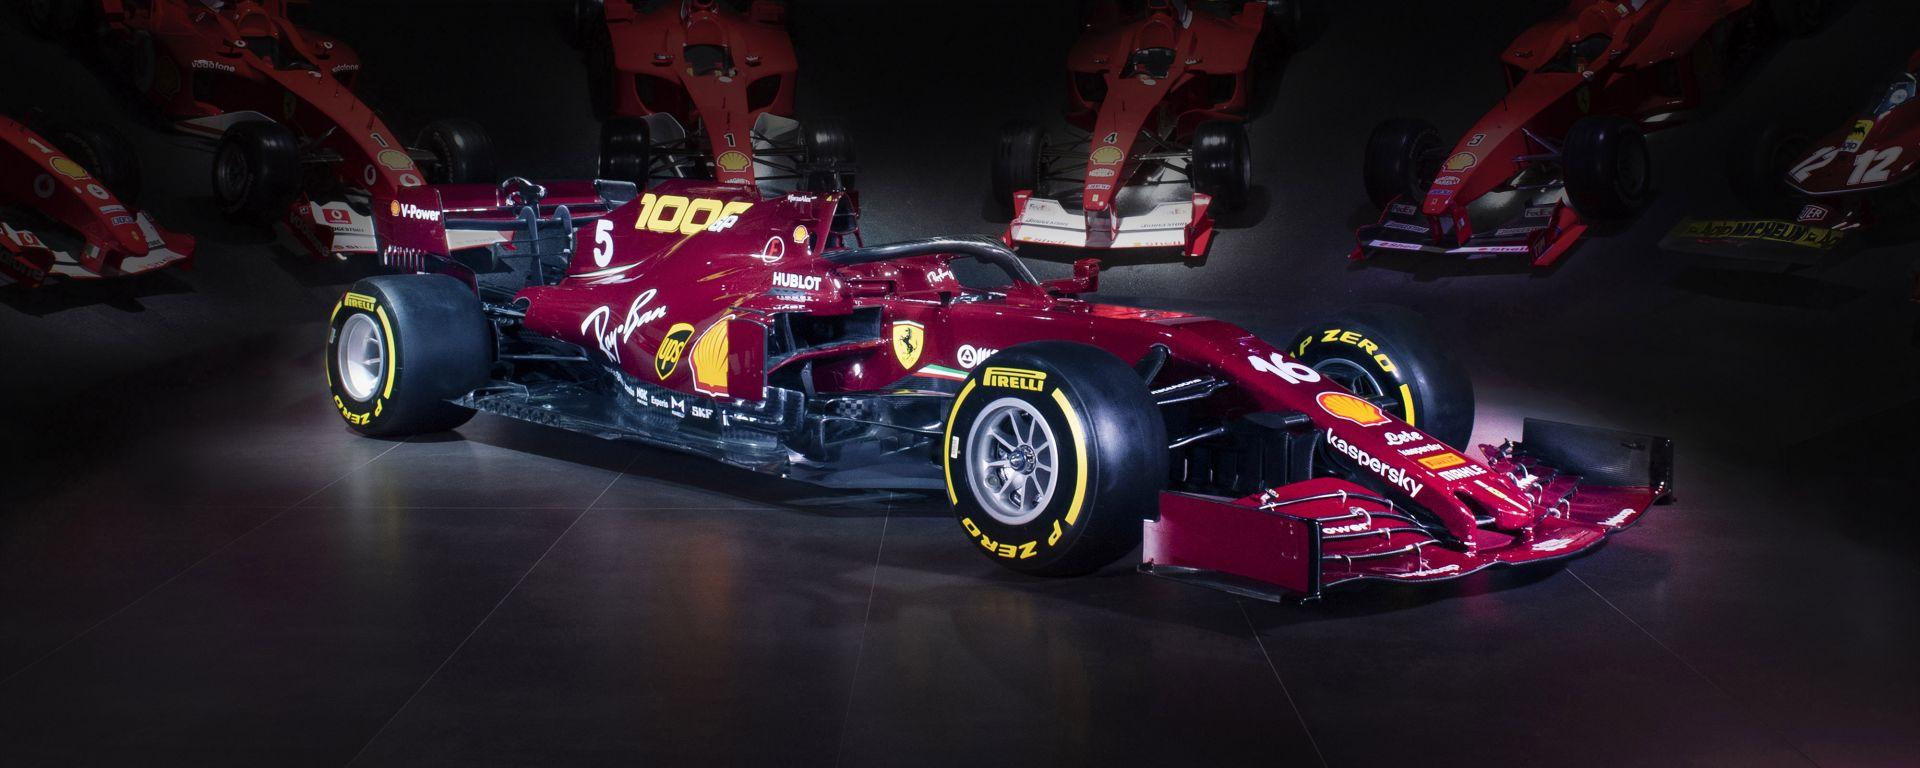 La Ferrari con la livrea del 1000° GP